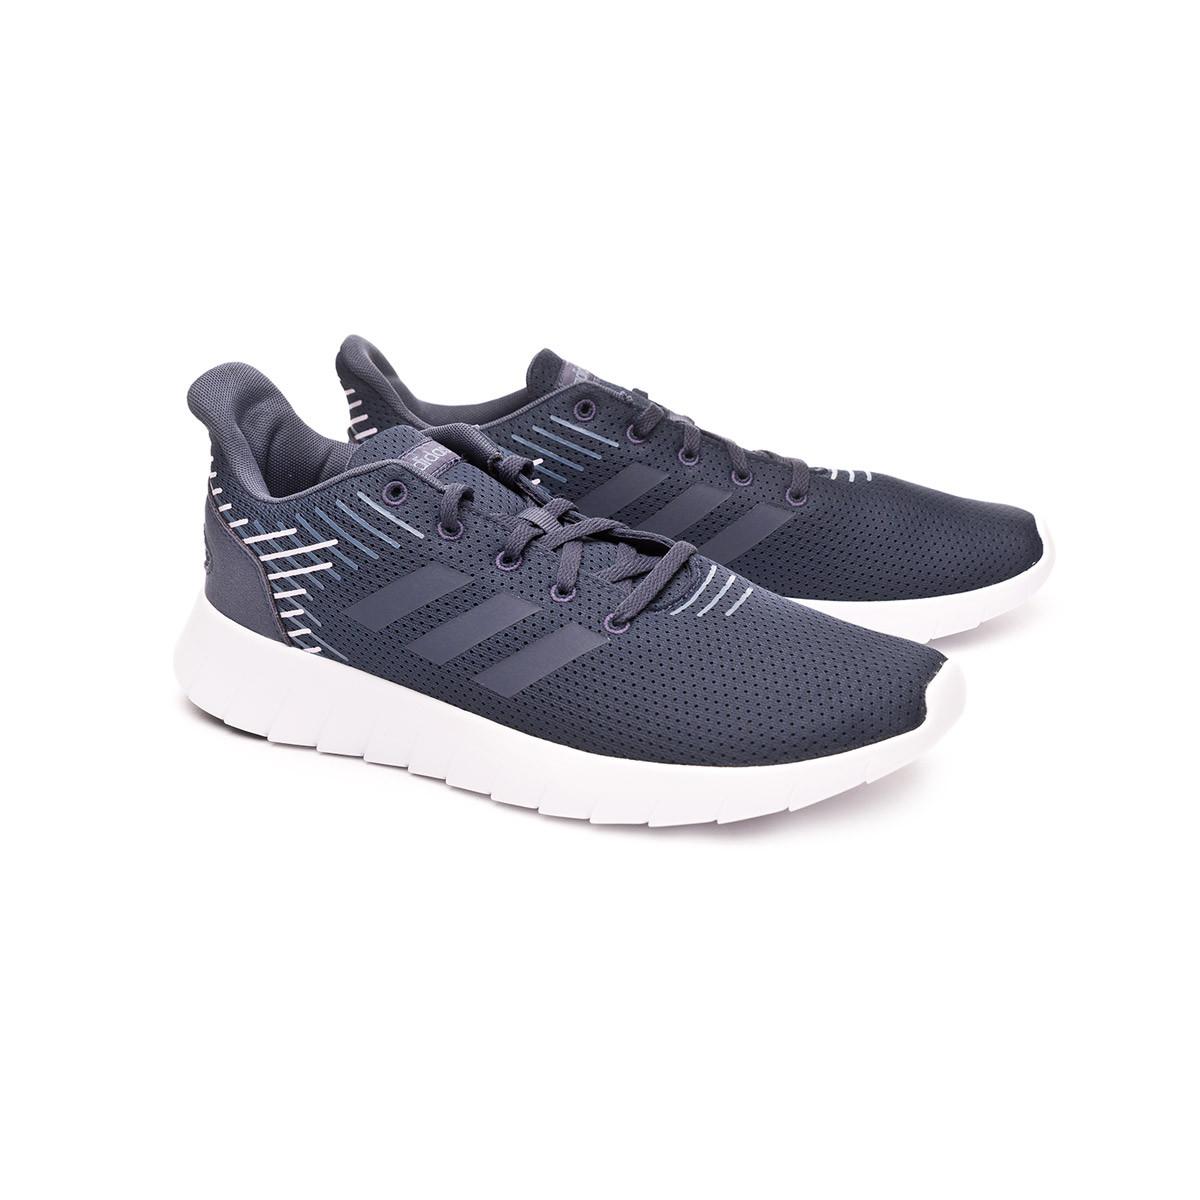 mens mizuno running shoes size 9.5 in europe zaragoza normal